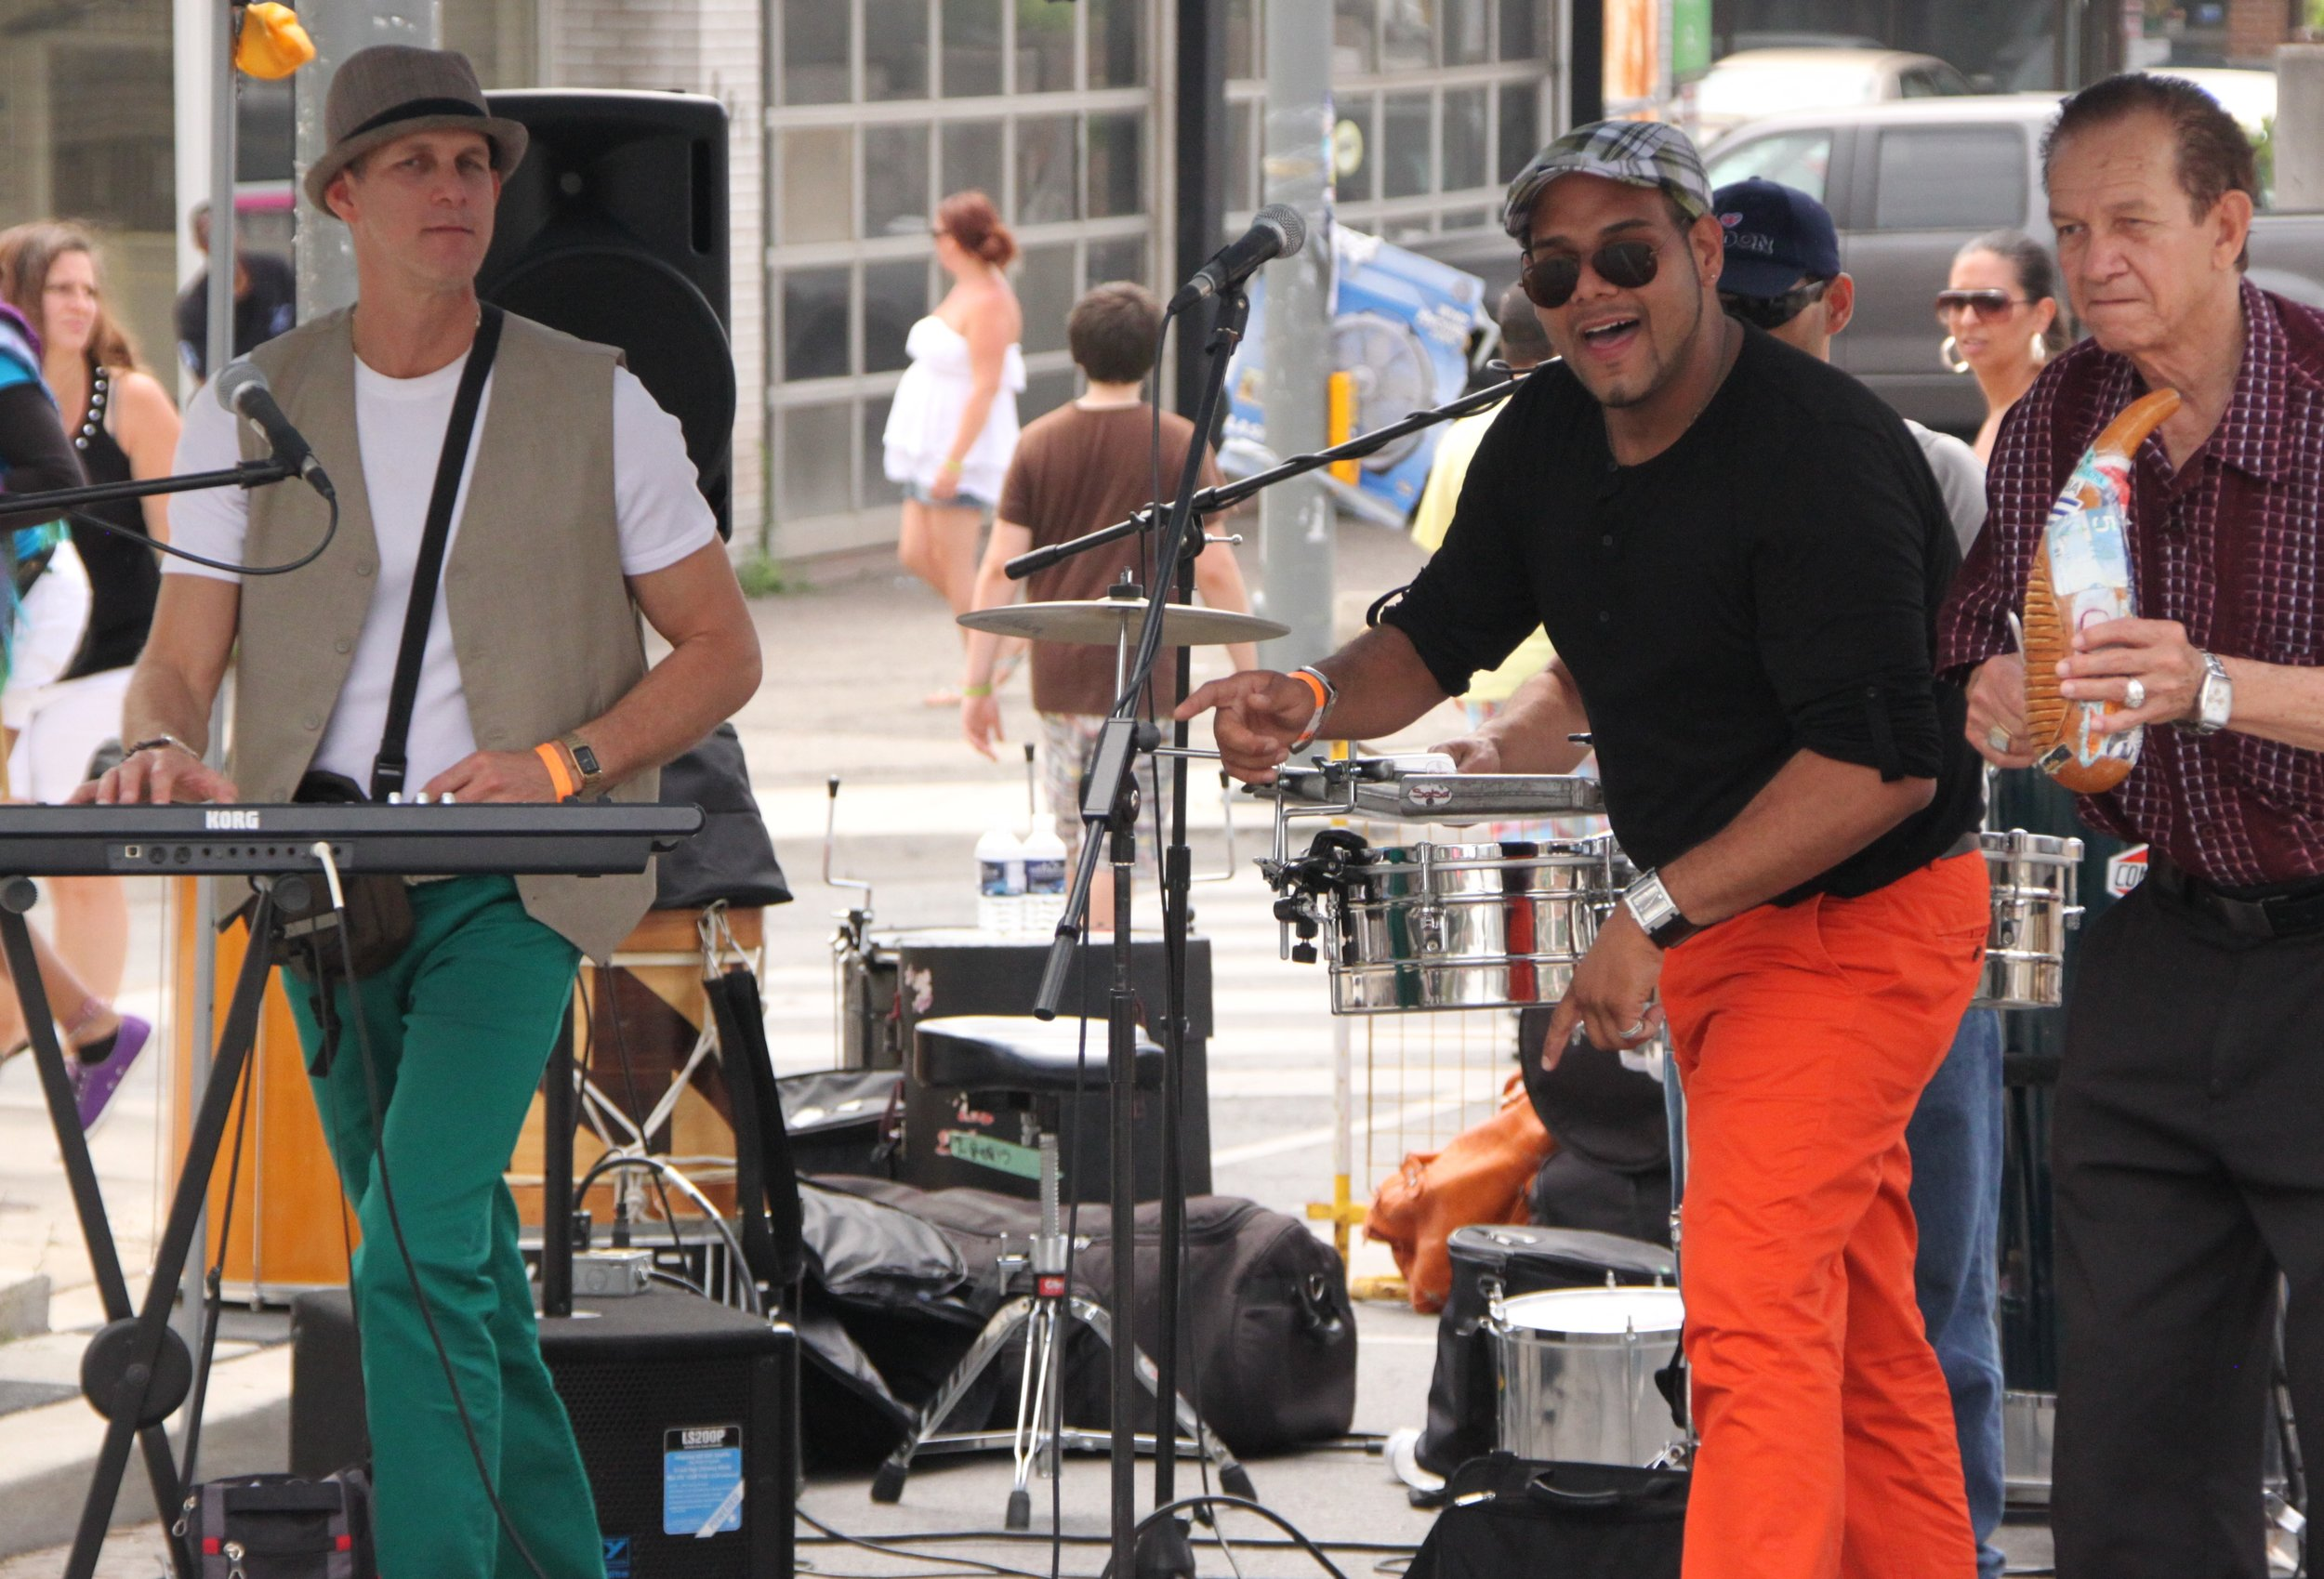 Ricardo-Barboza-y-su-Tumbao-Music-bands.jpg